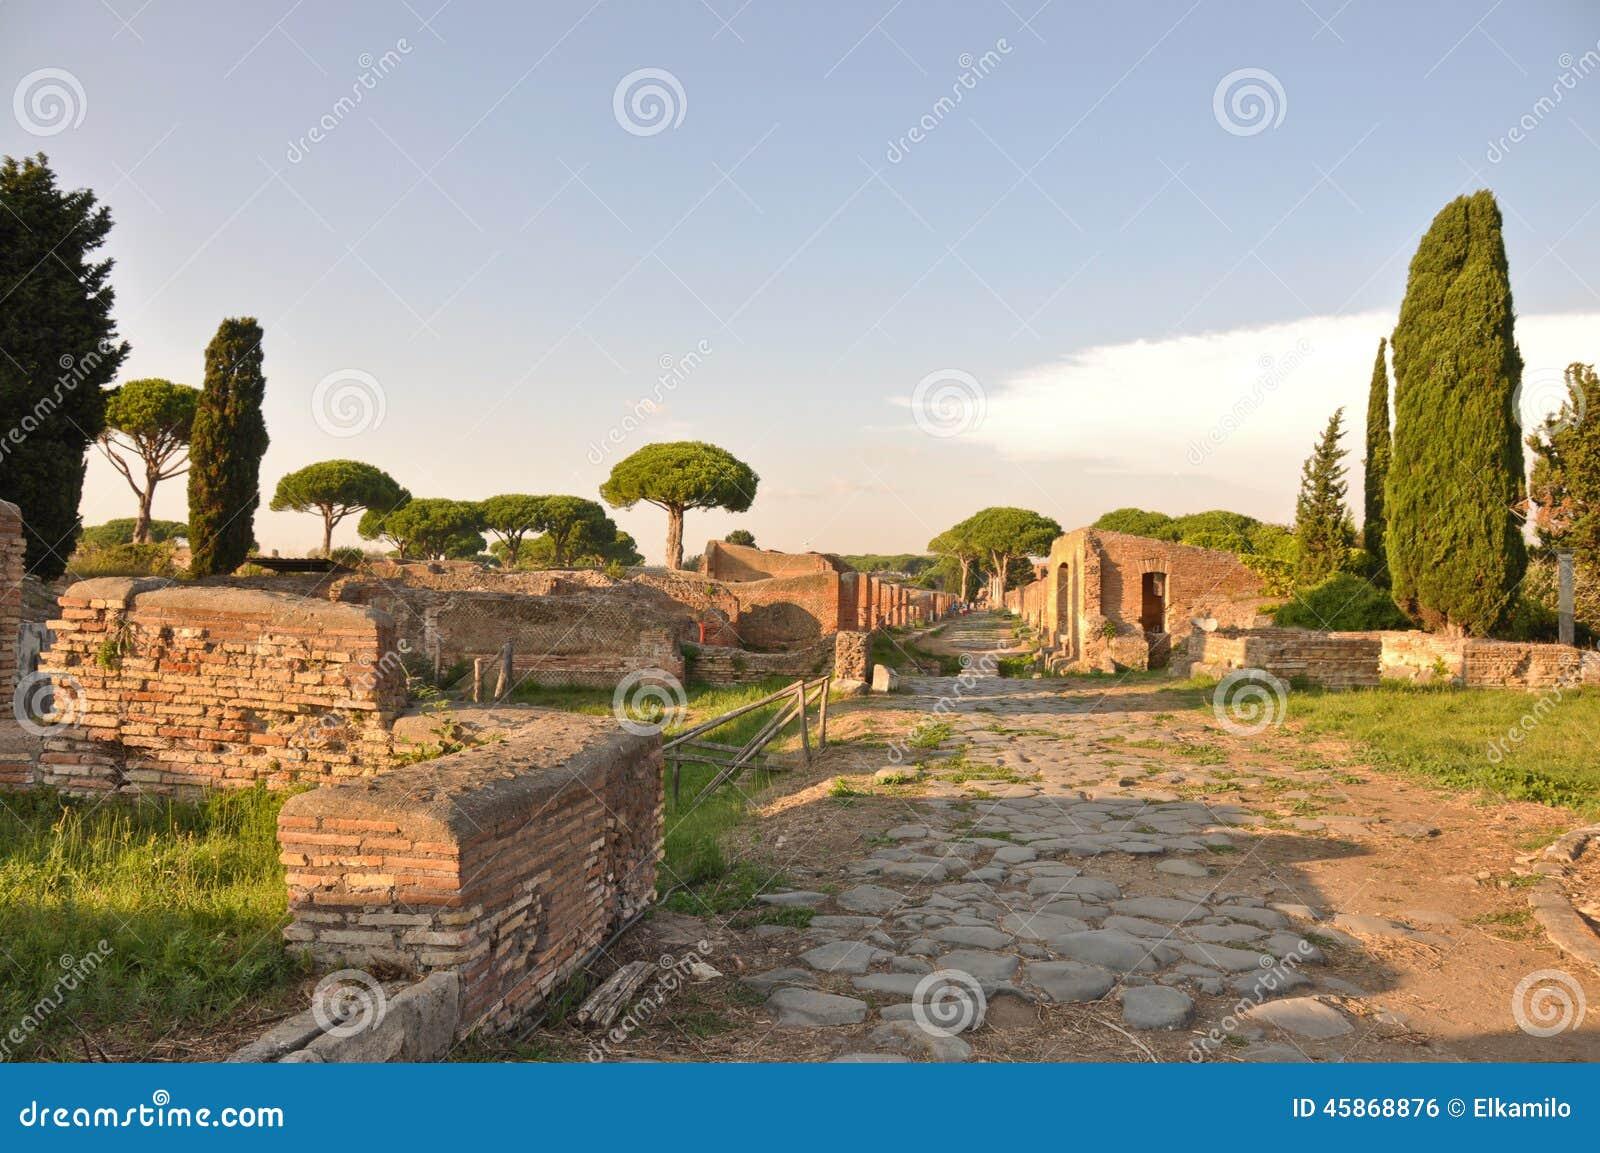 Ostia antica ancient city stock photo image 45868876 for Mr arredamenti ostia antica